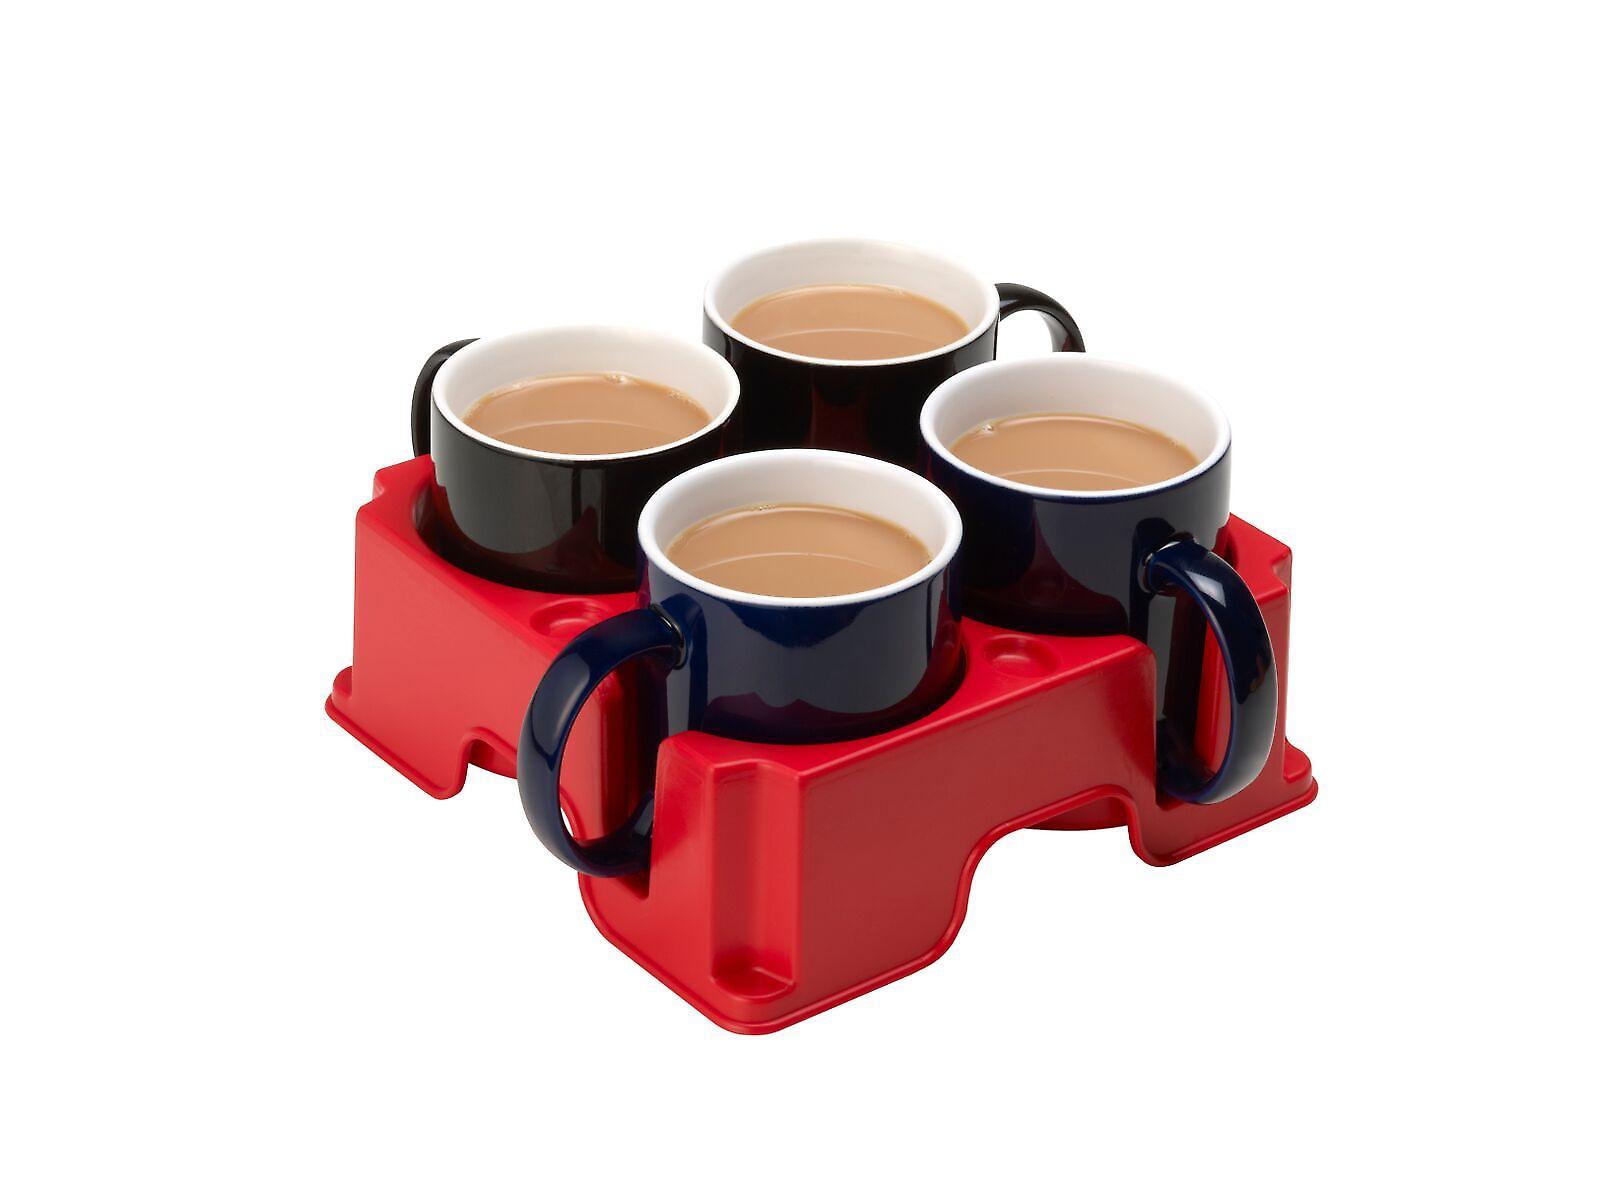 Red Muggi - Nonslip drink tray